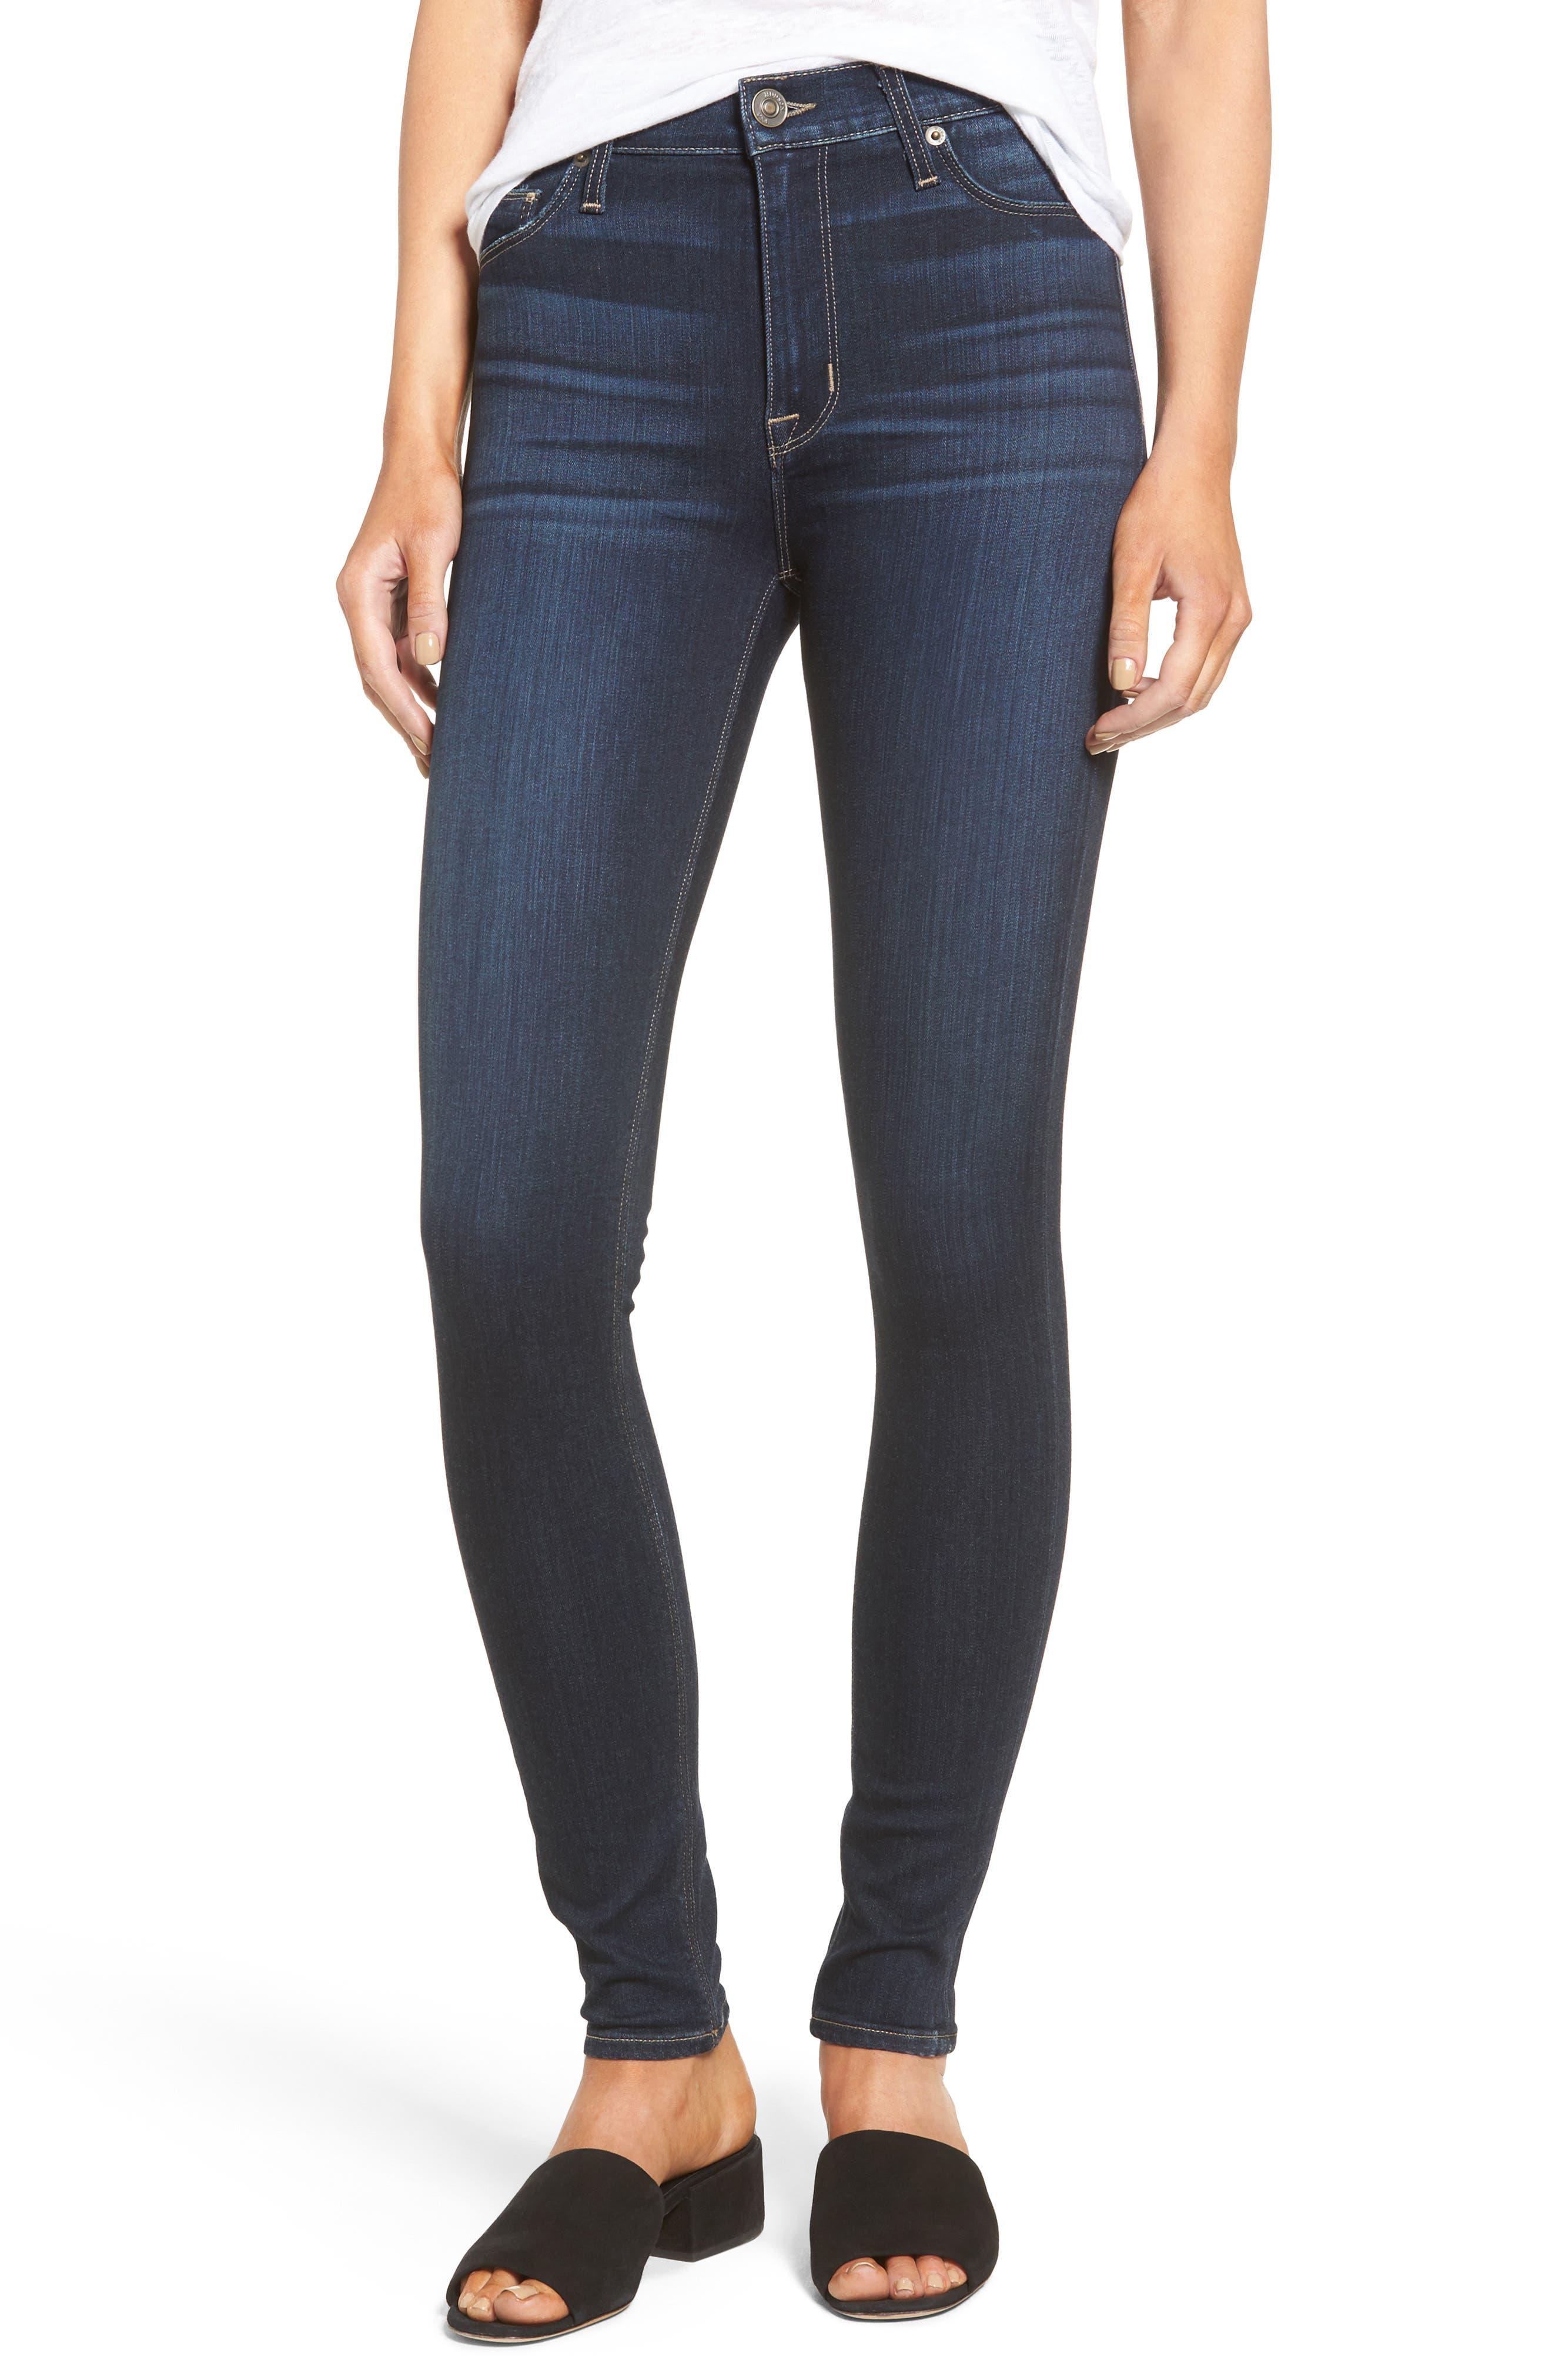 Main Image - Hudson Jeans Barbara High Waist Super Skinny Jeans (Recruit 2)